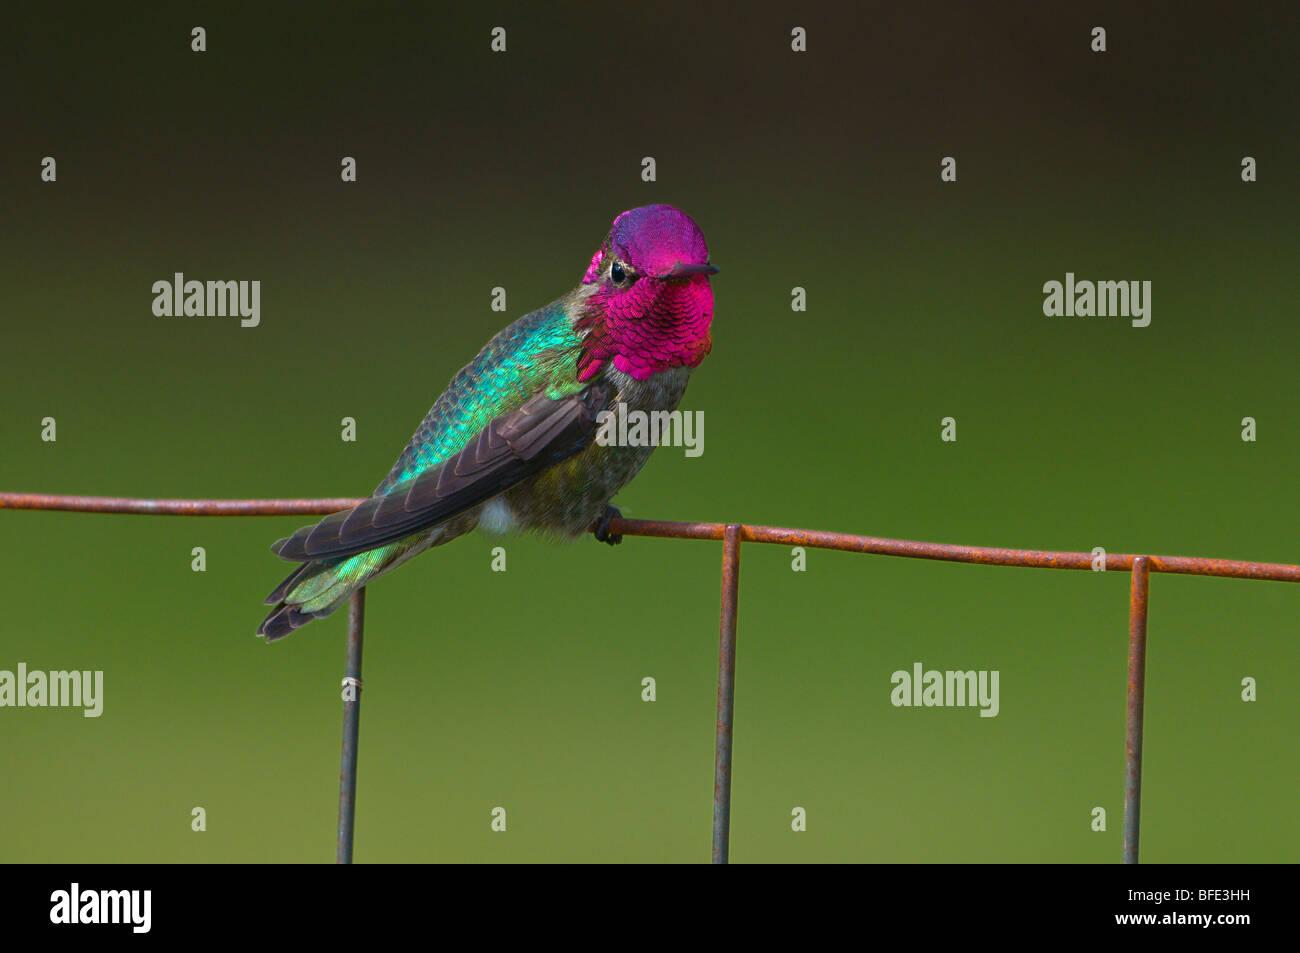 Male Anna's hummingbird (Calypte anna) on wire fence in Victoria, Vancouver Island, British Columbia, Canada - Stock Image